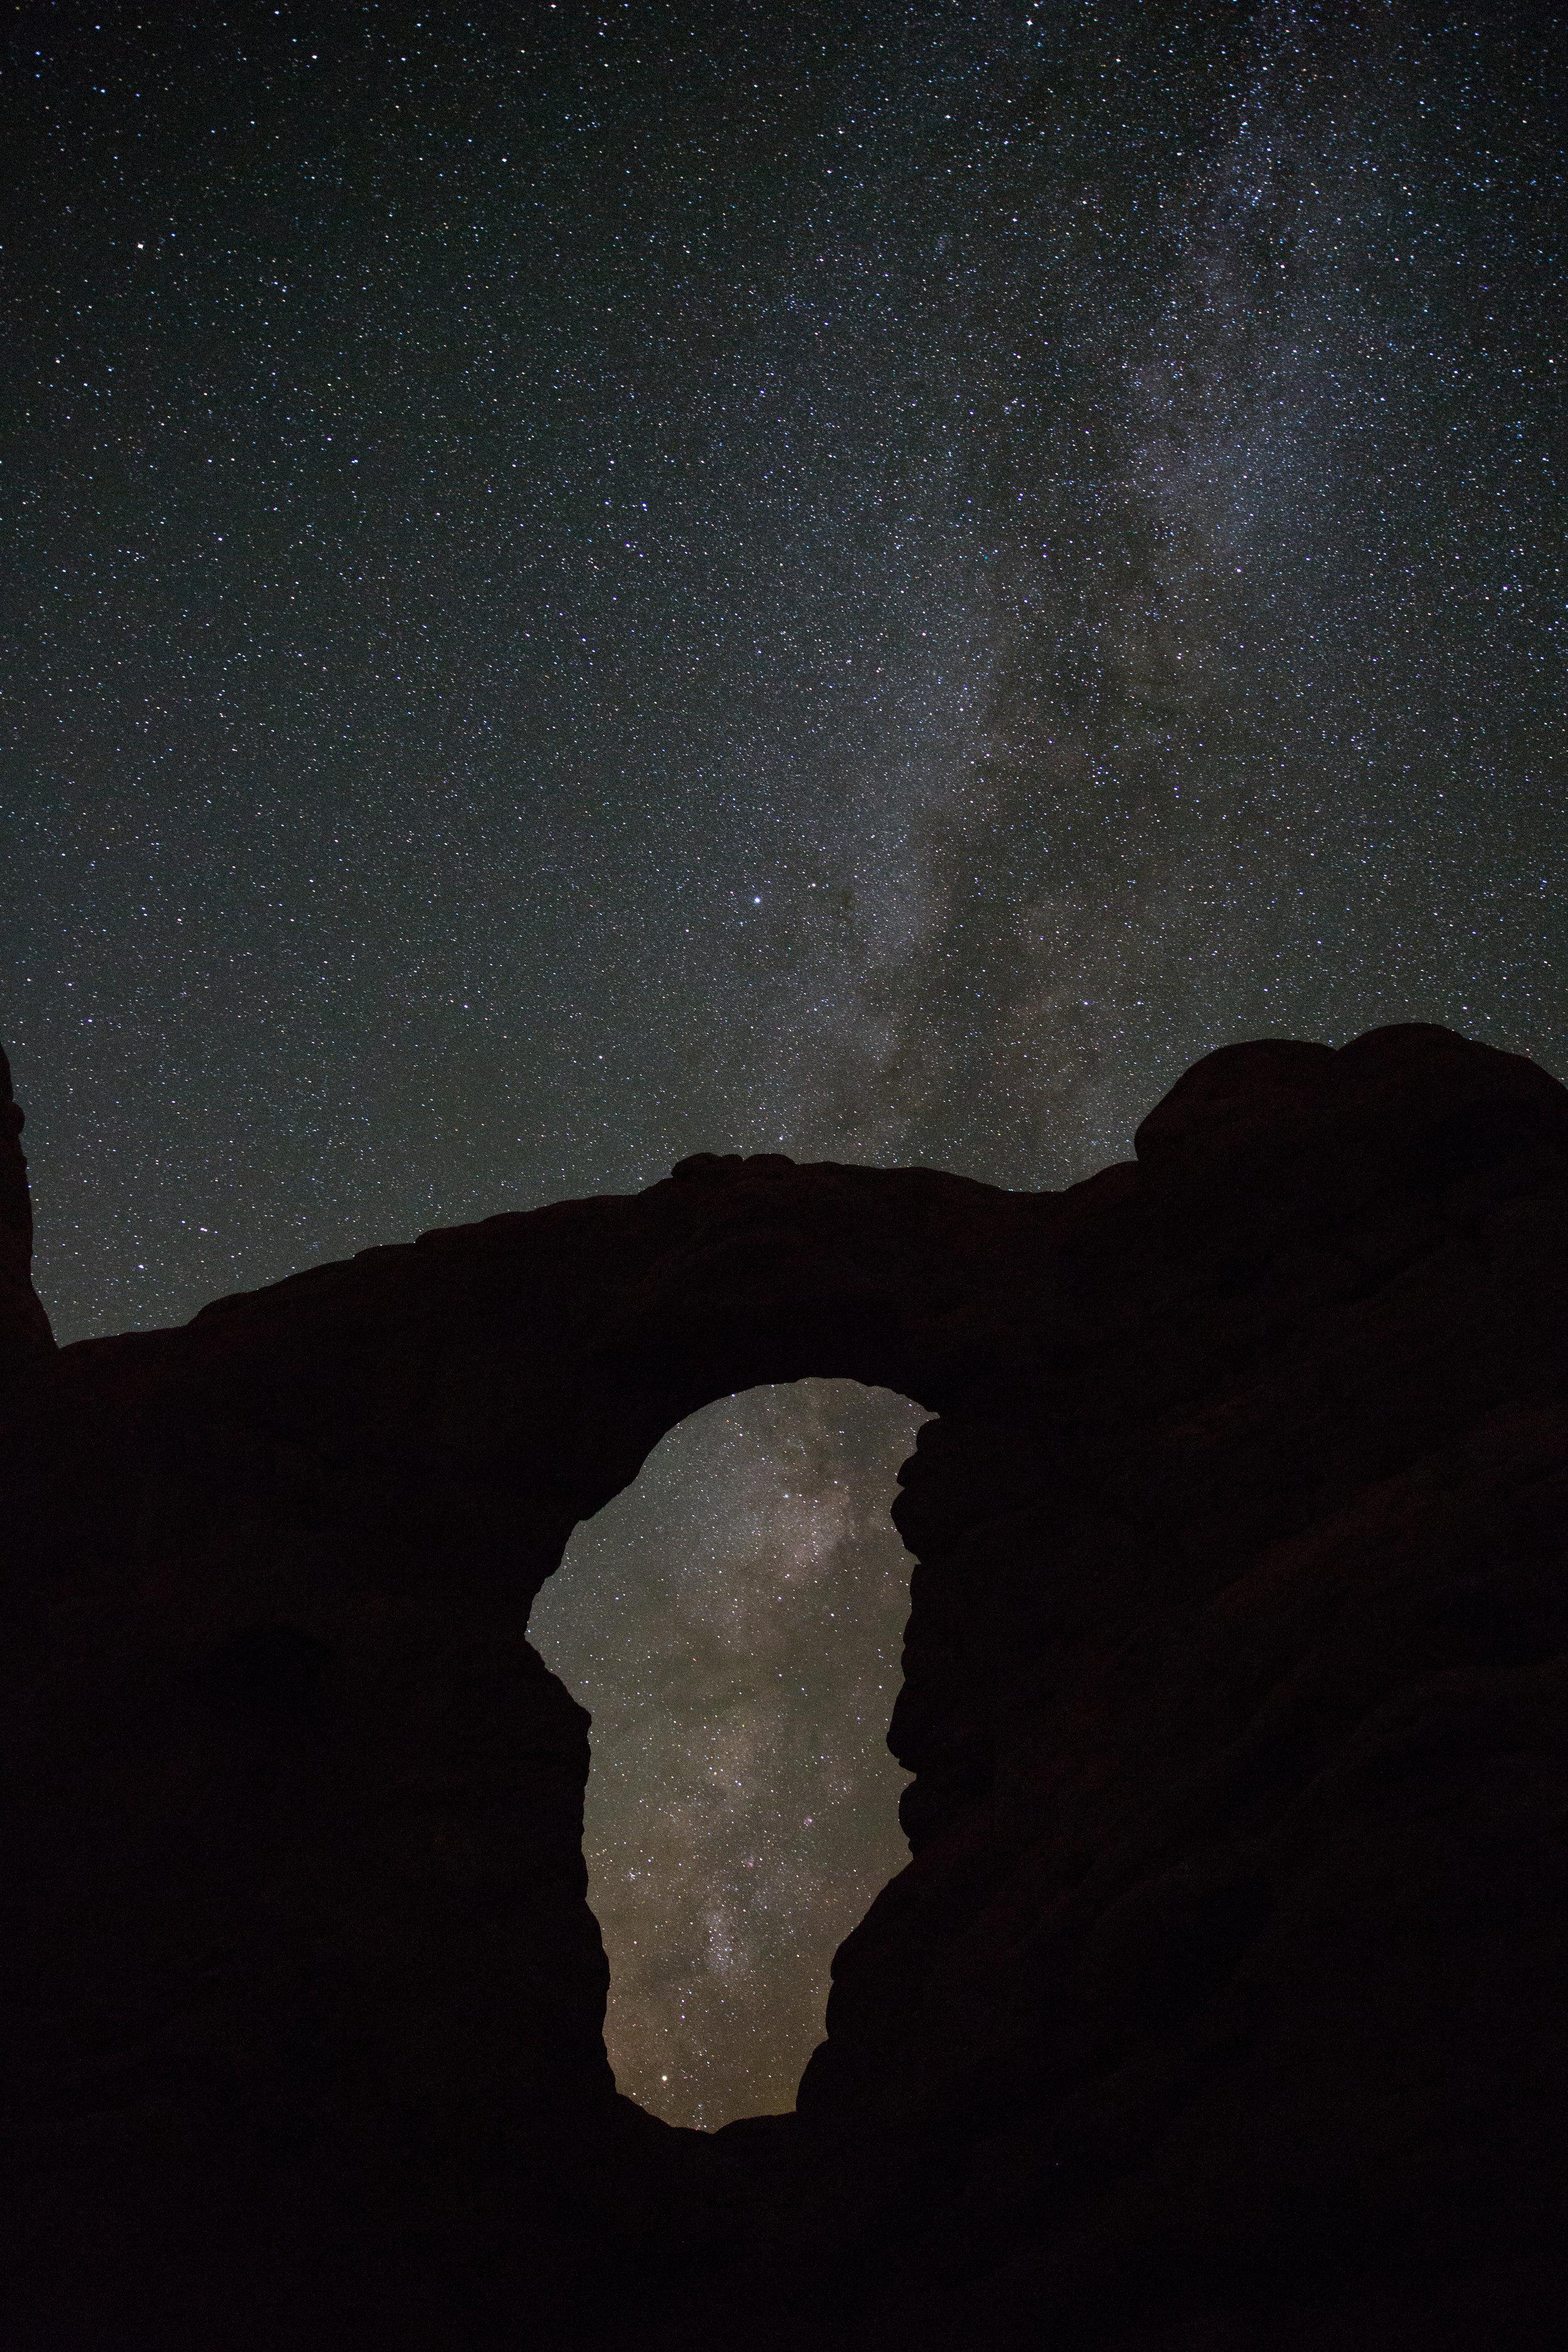 Astrophotography, Photography, Night Photography, Turret Arch, Turret At Night, Galaxy, Milky Way, Adventure, Define Fettle,